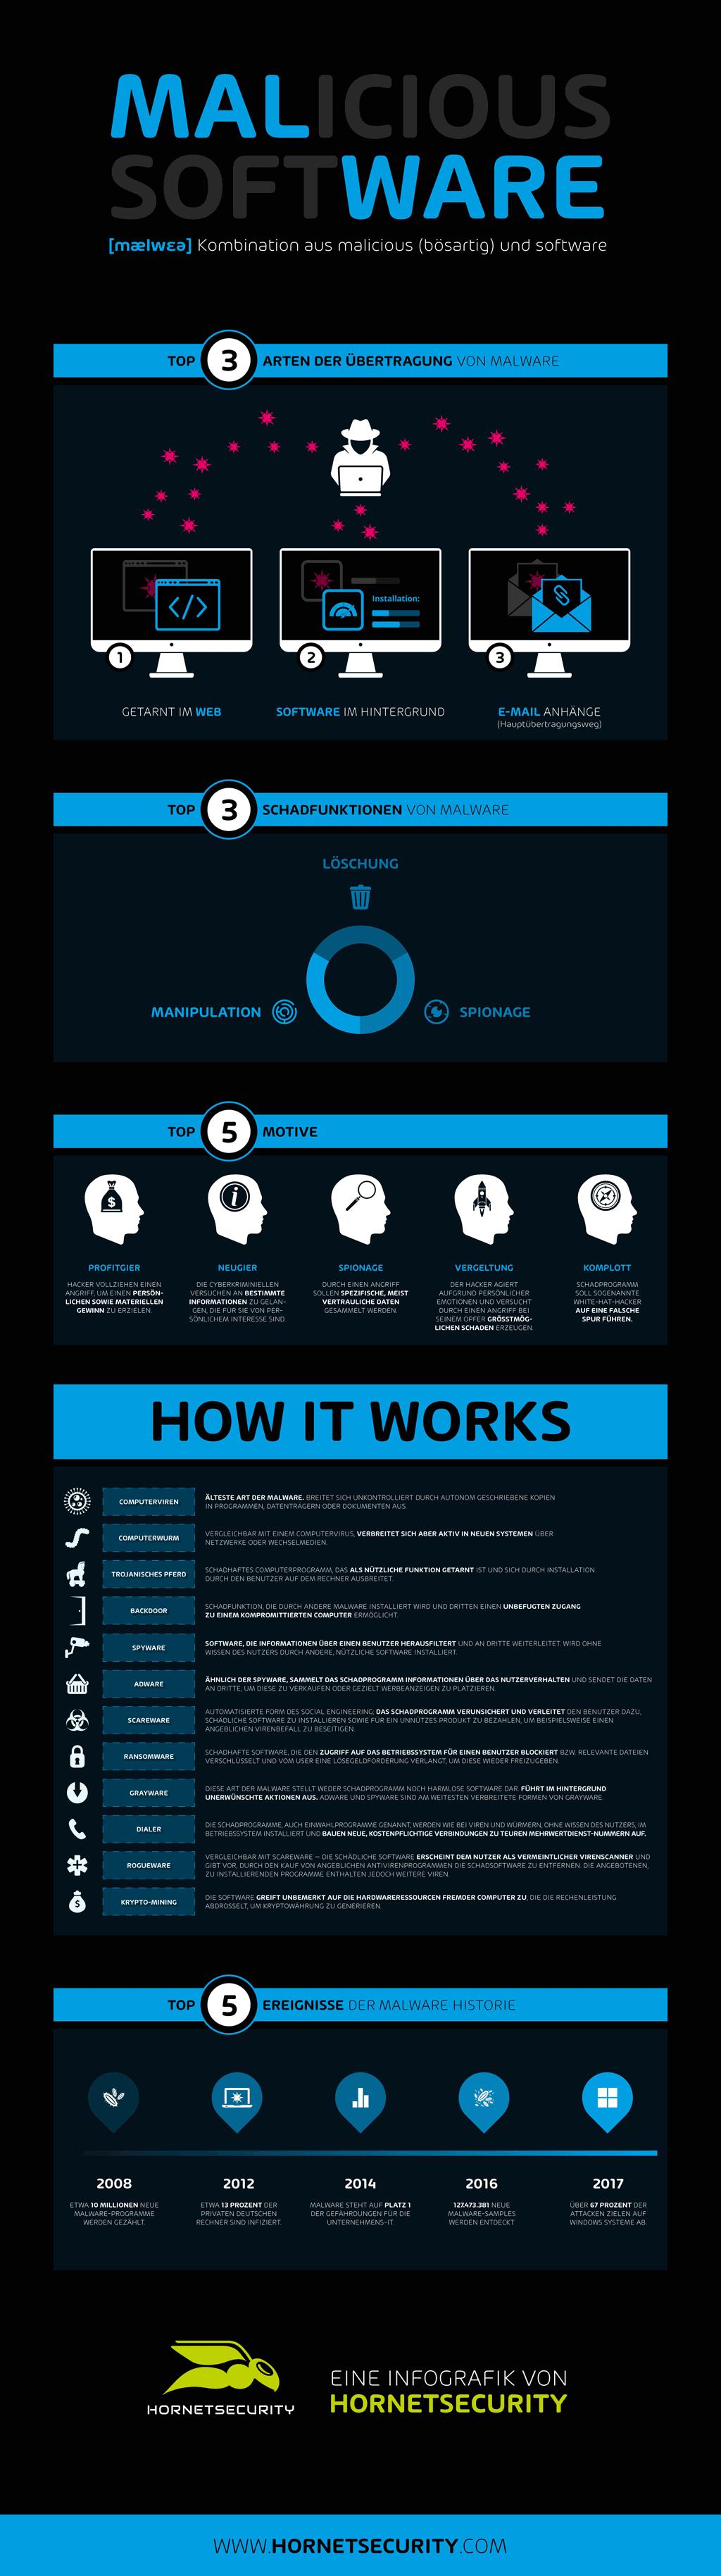 Malware Infografik